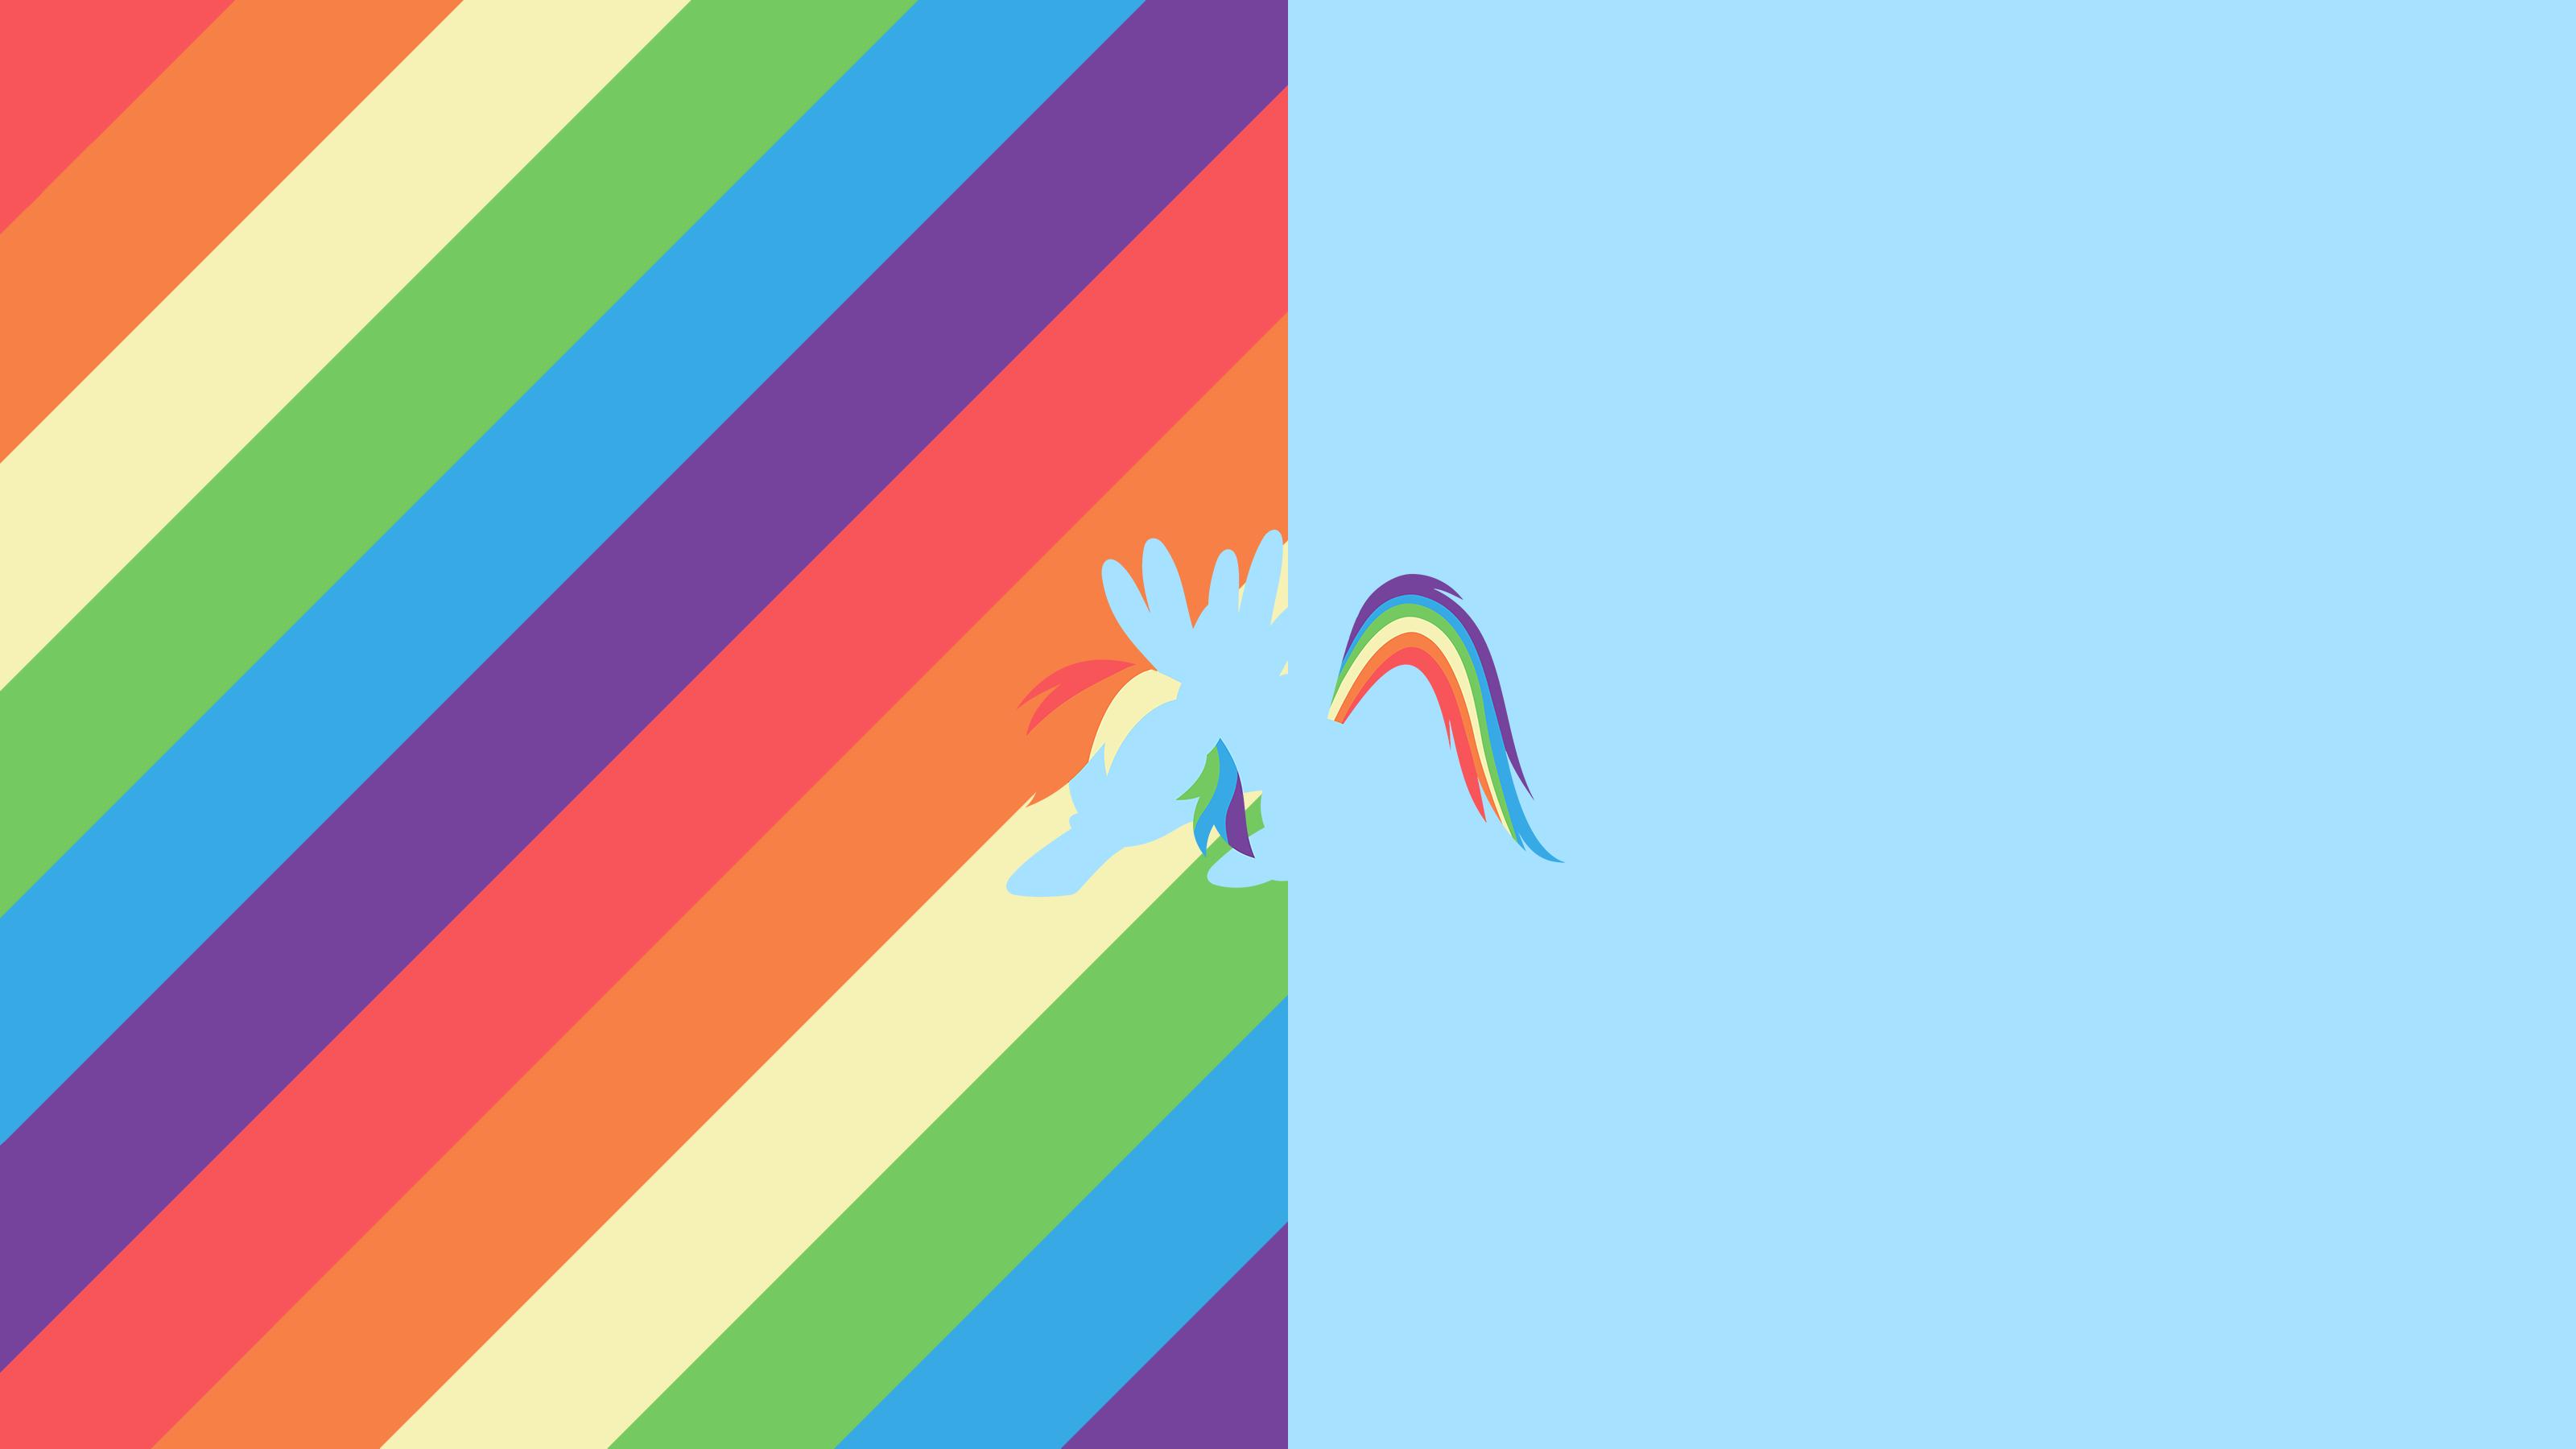 Rainbow Dash Split Minimal Wallpaper by CeruleanDraw on DeviantArt